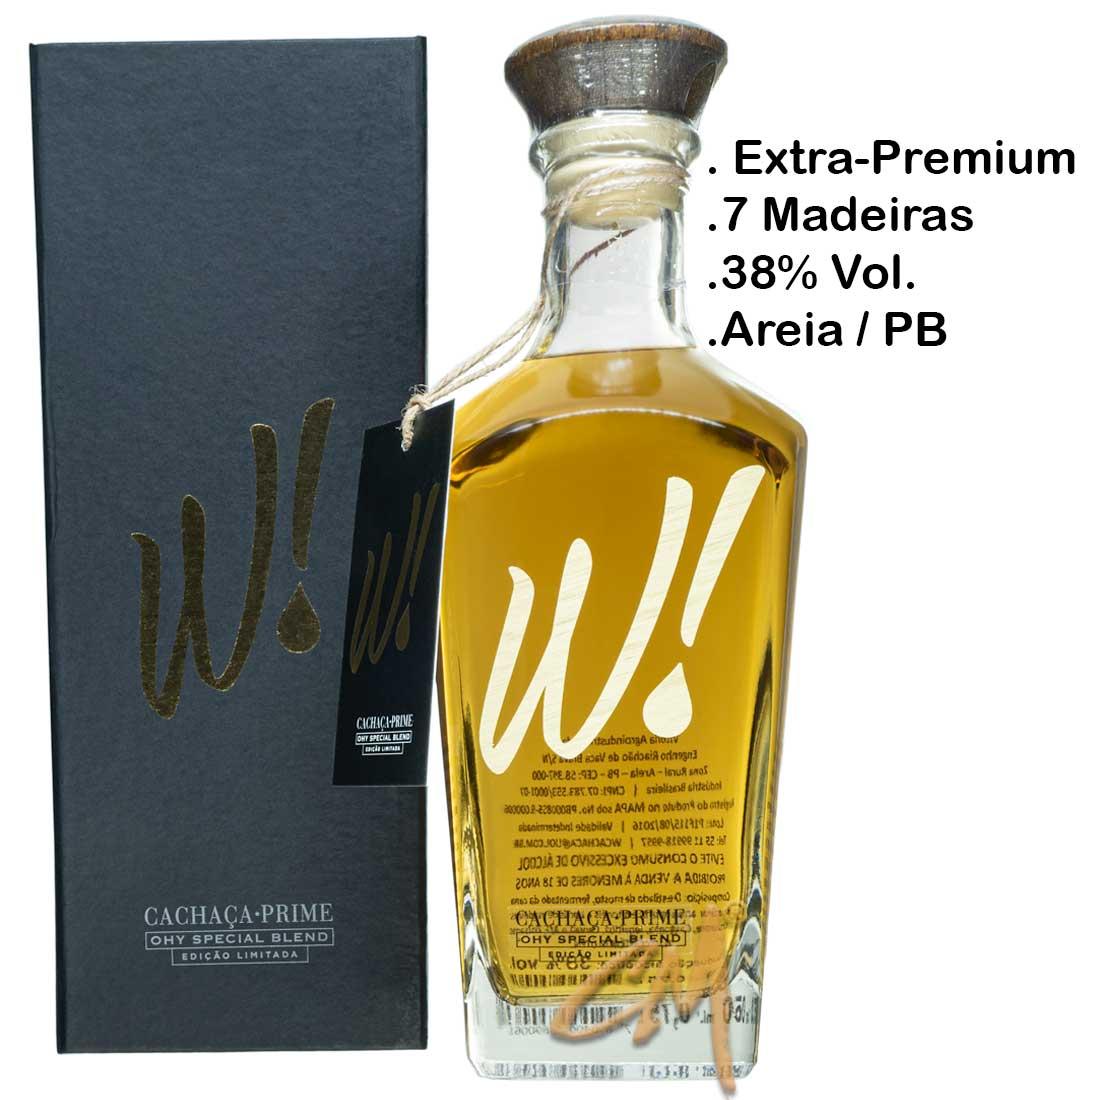 Cachaça W! Prime 7 Madeiras750 ml (Areia - PB)